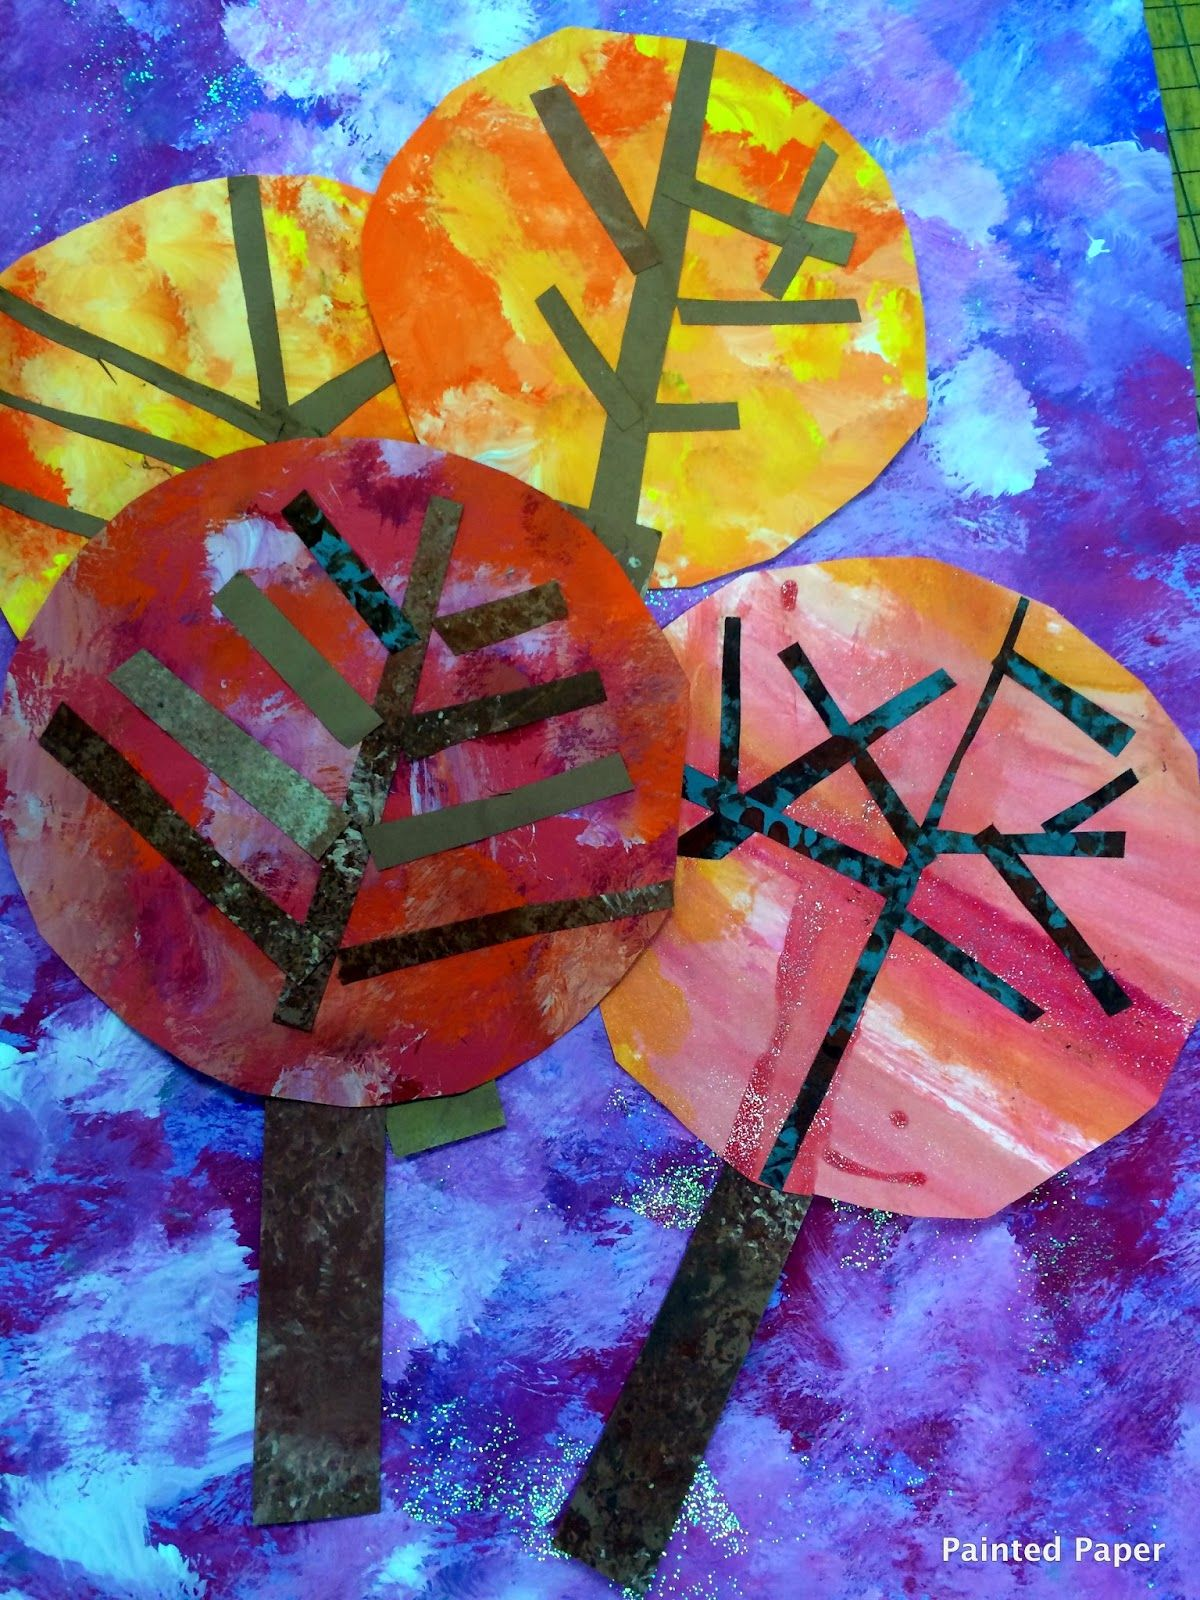 Painted Paper Autumn Trees Warm Colors Cool Colors Sponge Painting